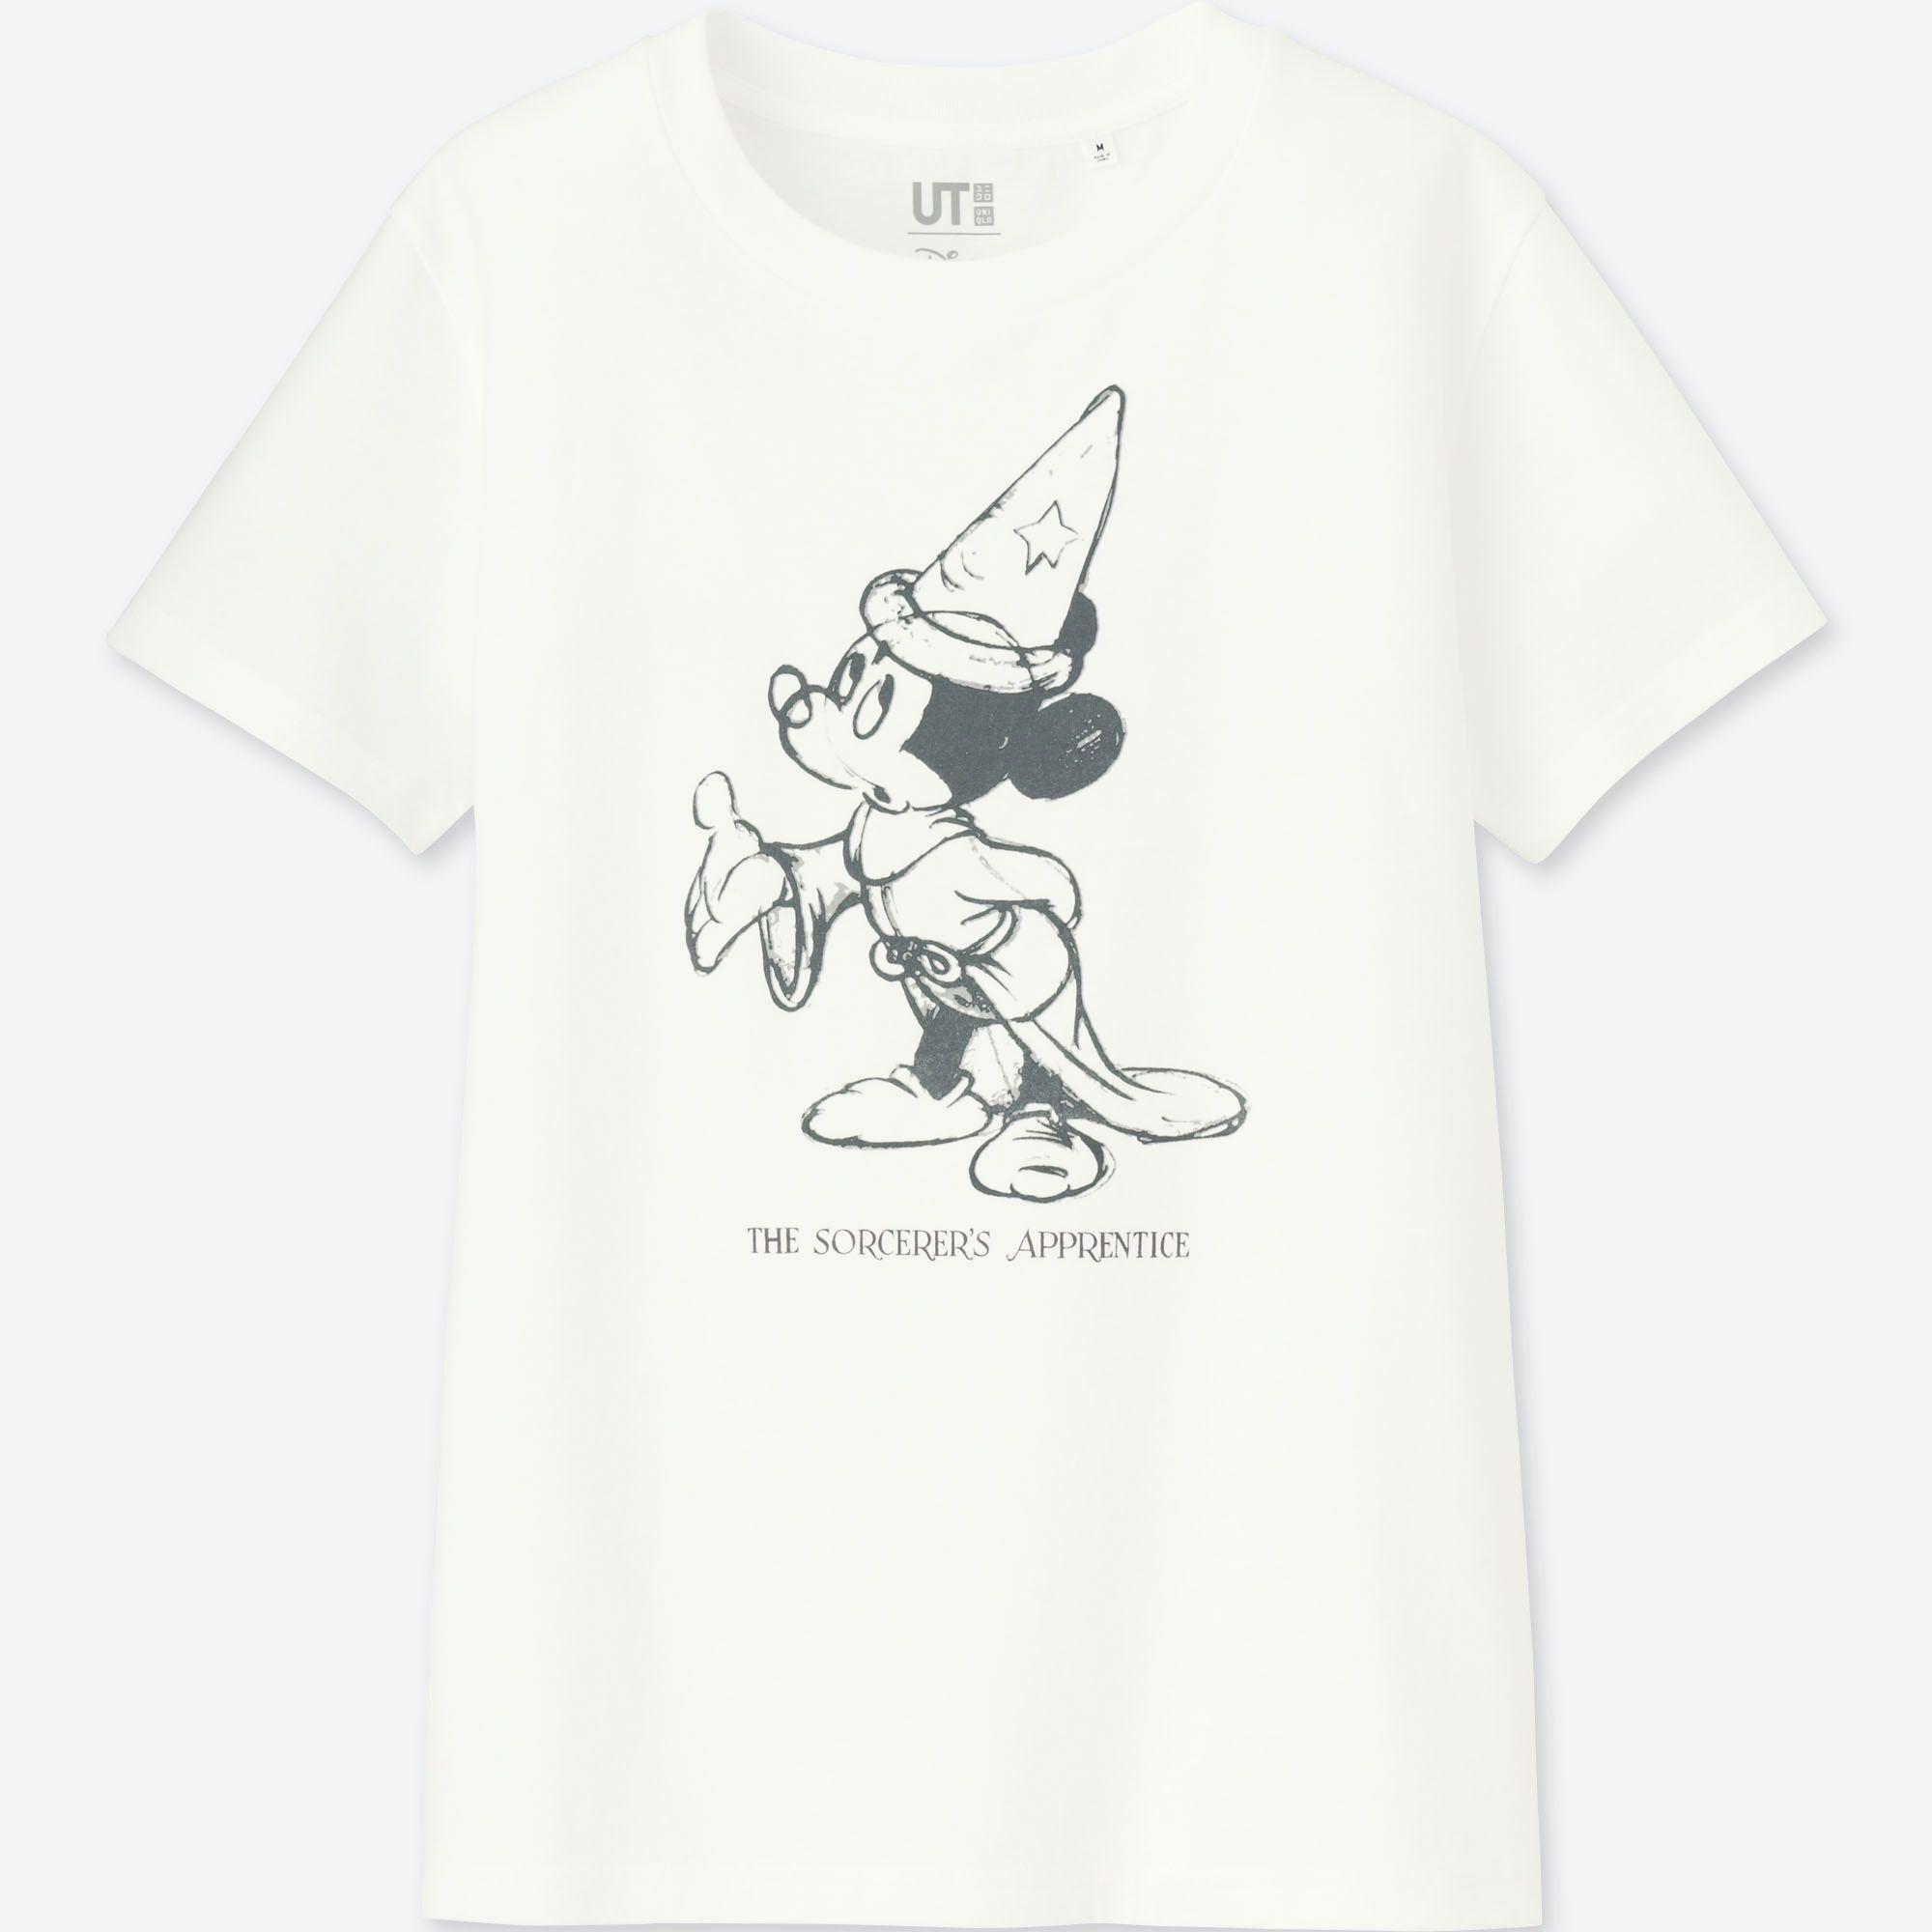 Uniqlo's Fantasia Collection Brings Some Disney Magic to Your Wardrobe